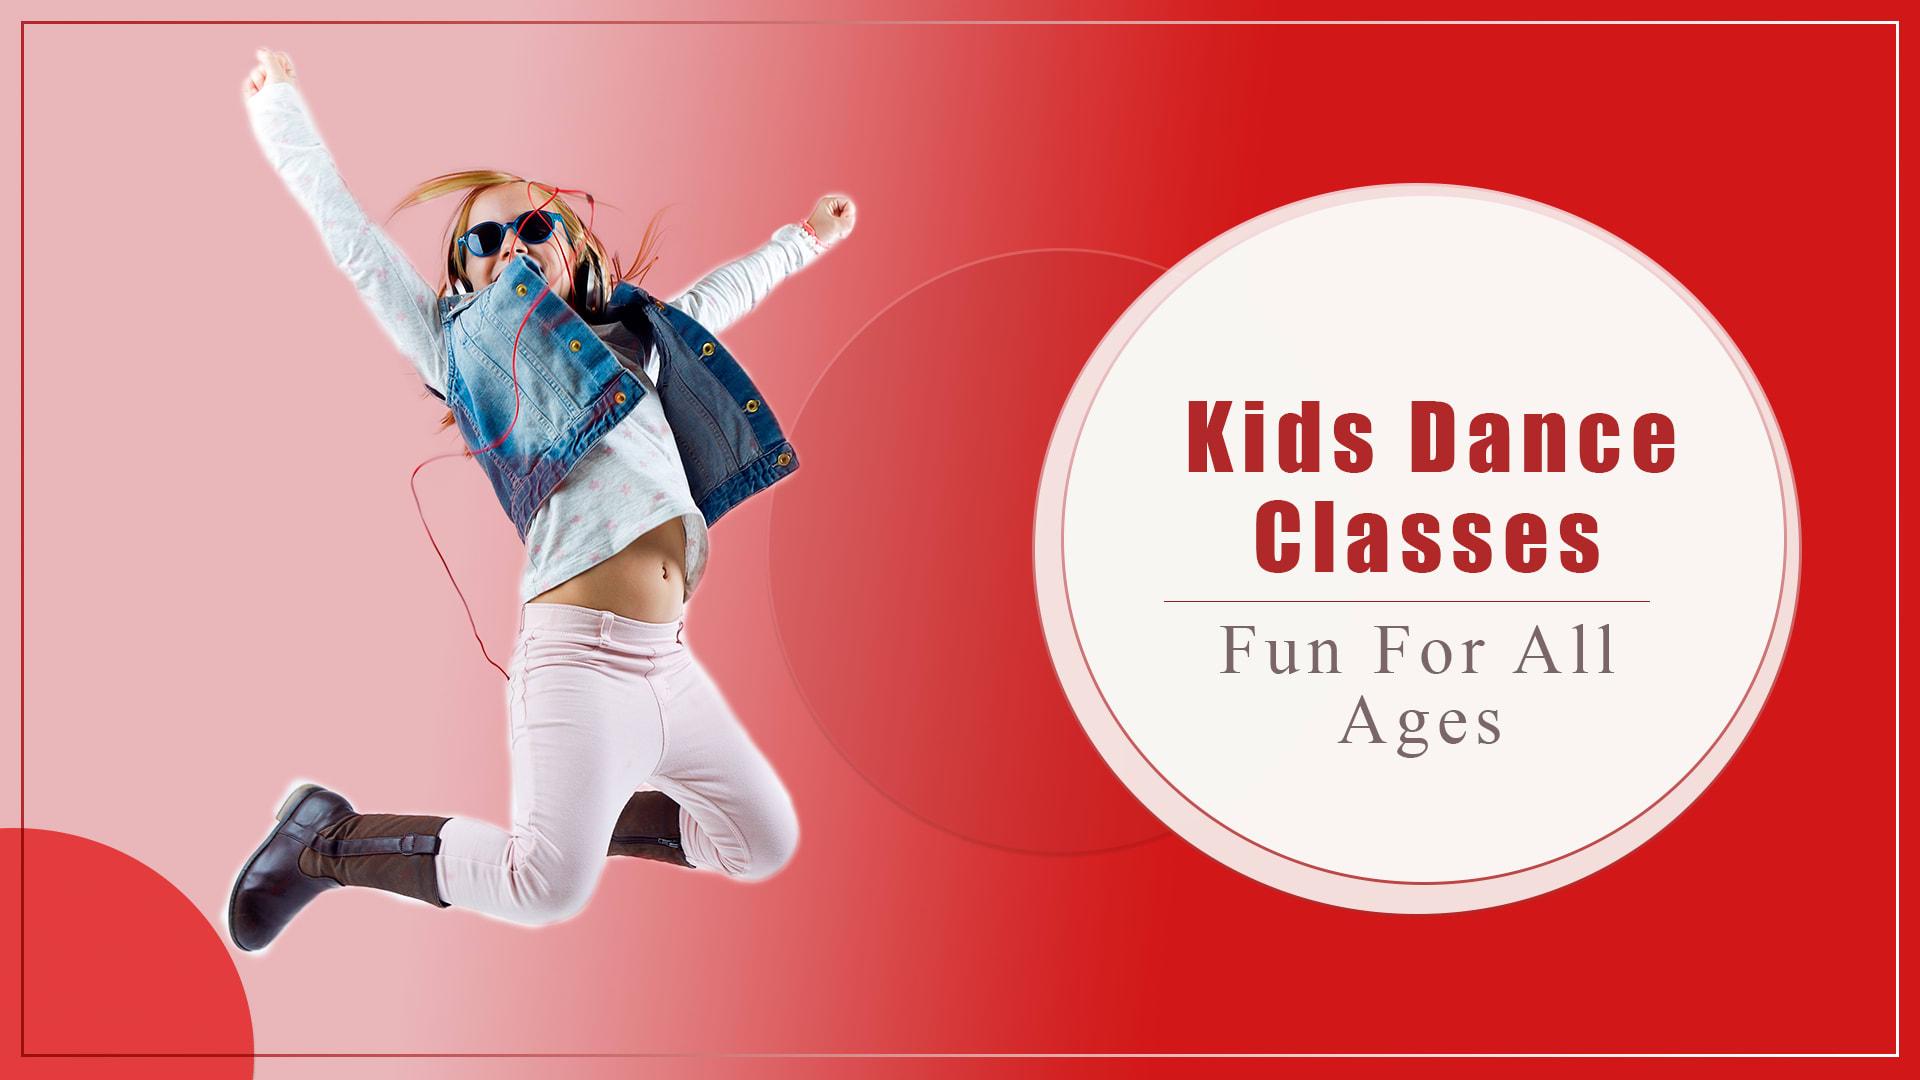 kids dance classes, dance classes for kids, fun for all ages, online dance classes, virtual dance classes, dance classes for kids, kids dance classes, online dance classes for kids, virtual classes for kids